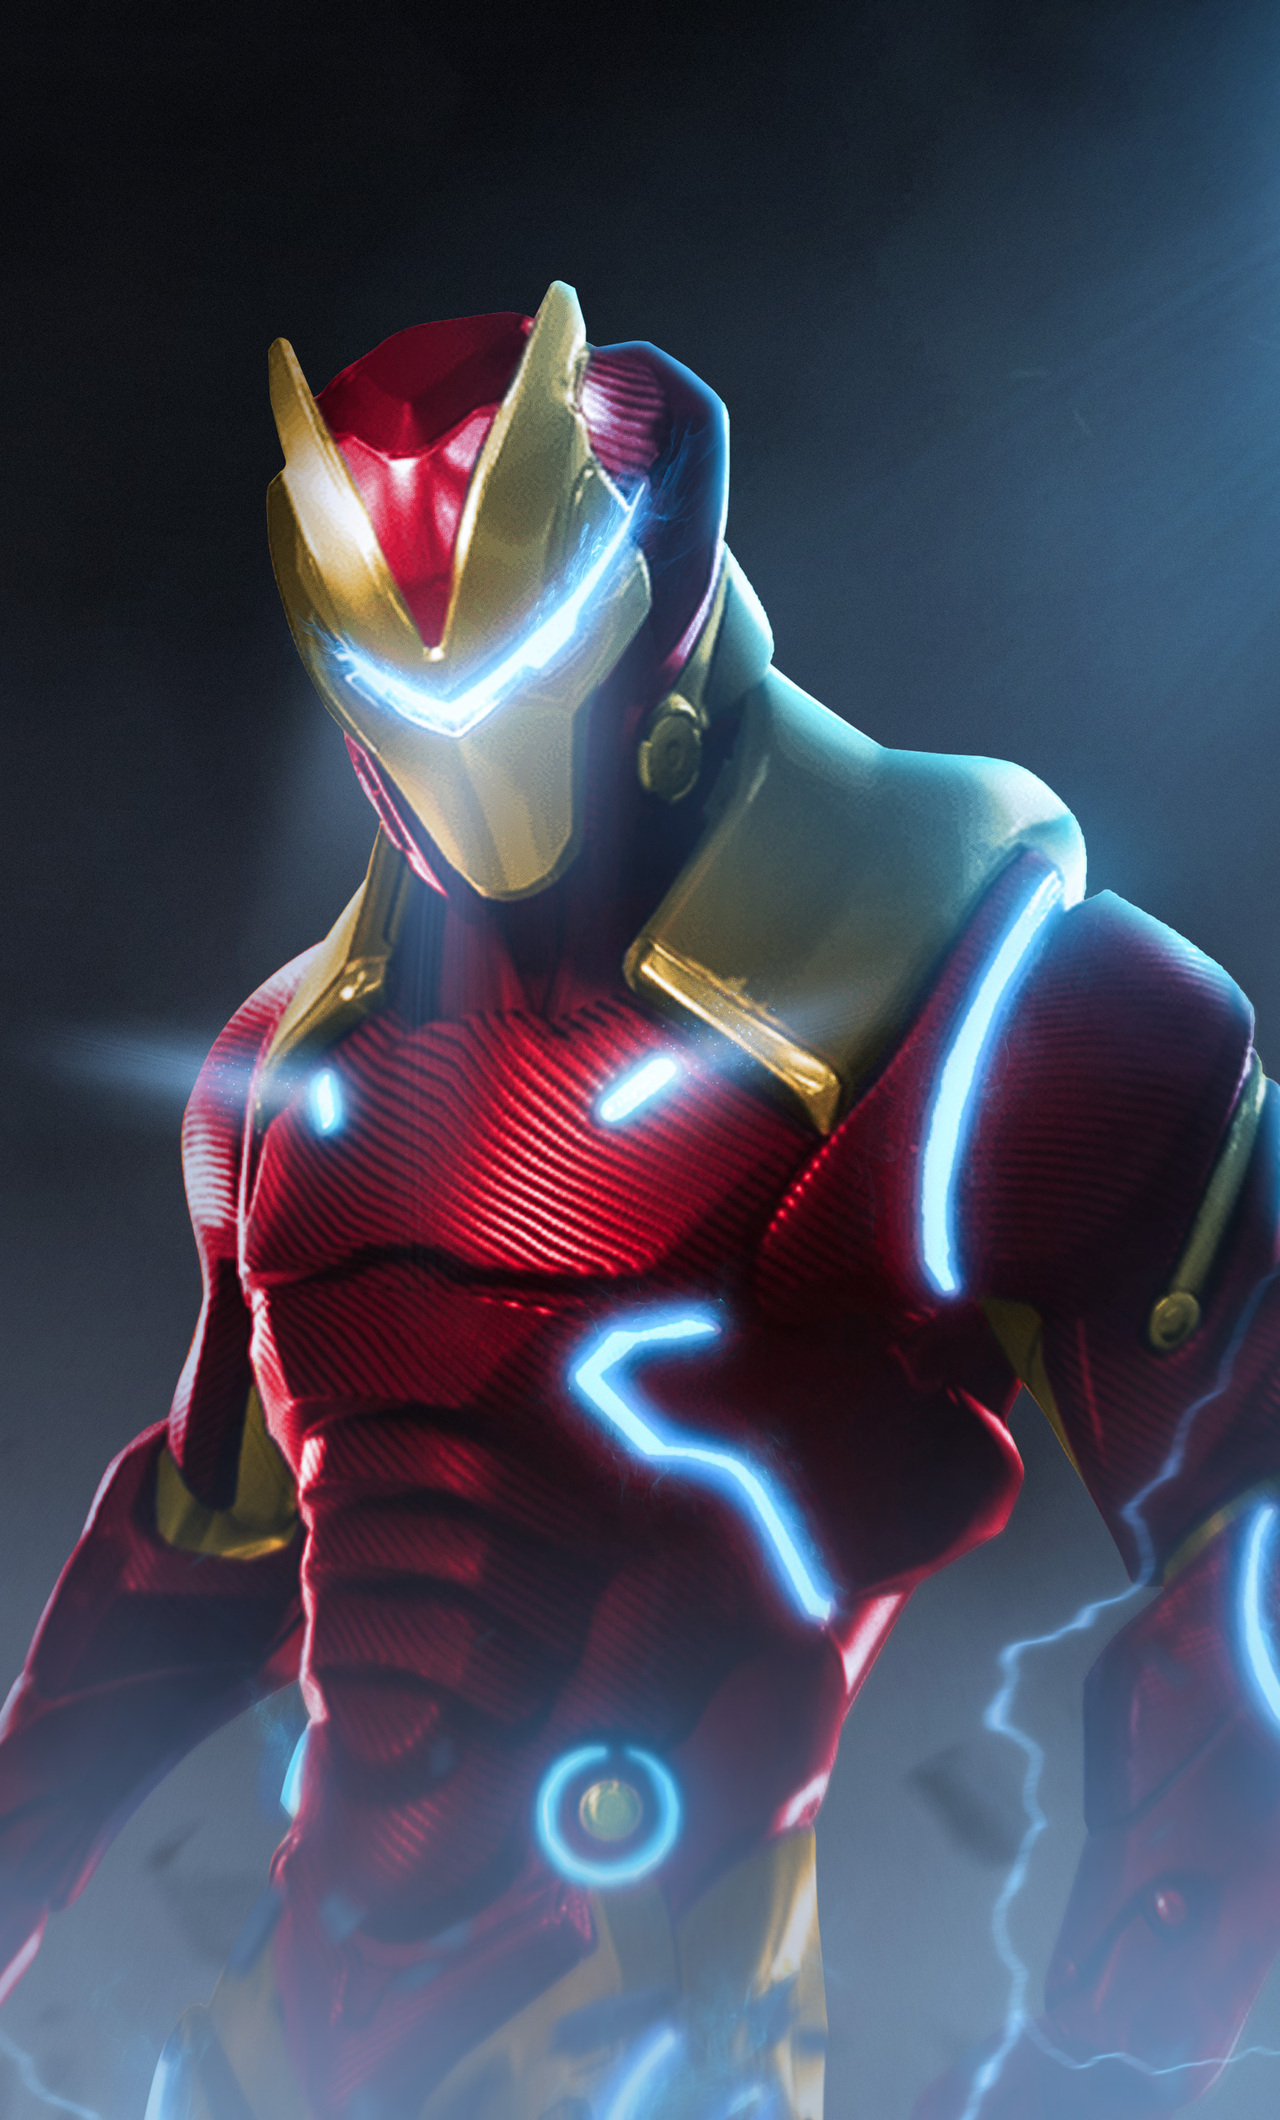 1280x2120 Fortnite X Marvel Iron Man Iphone 6 Hd 4k Wallpapers